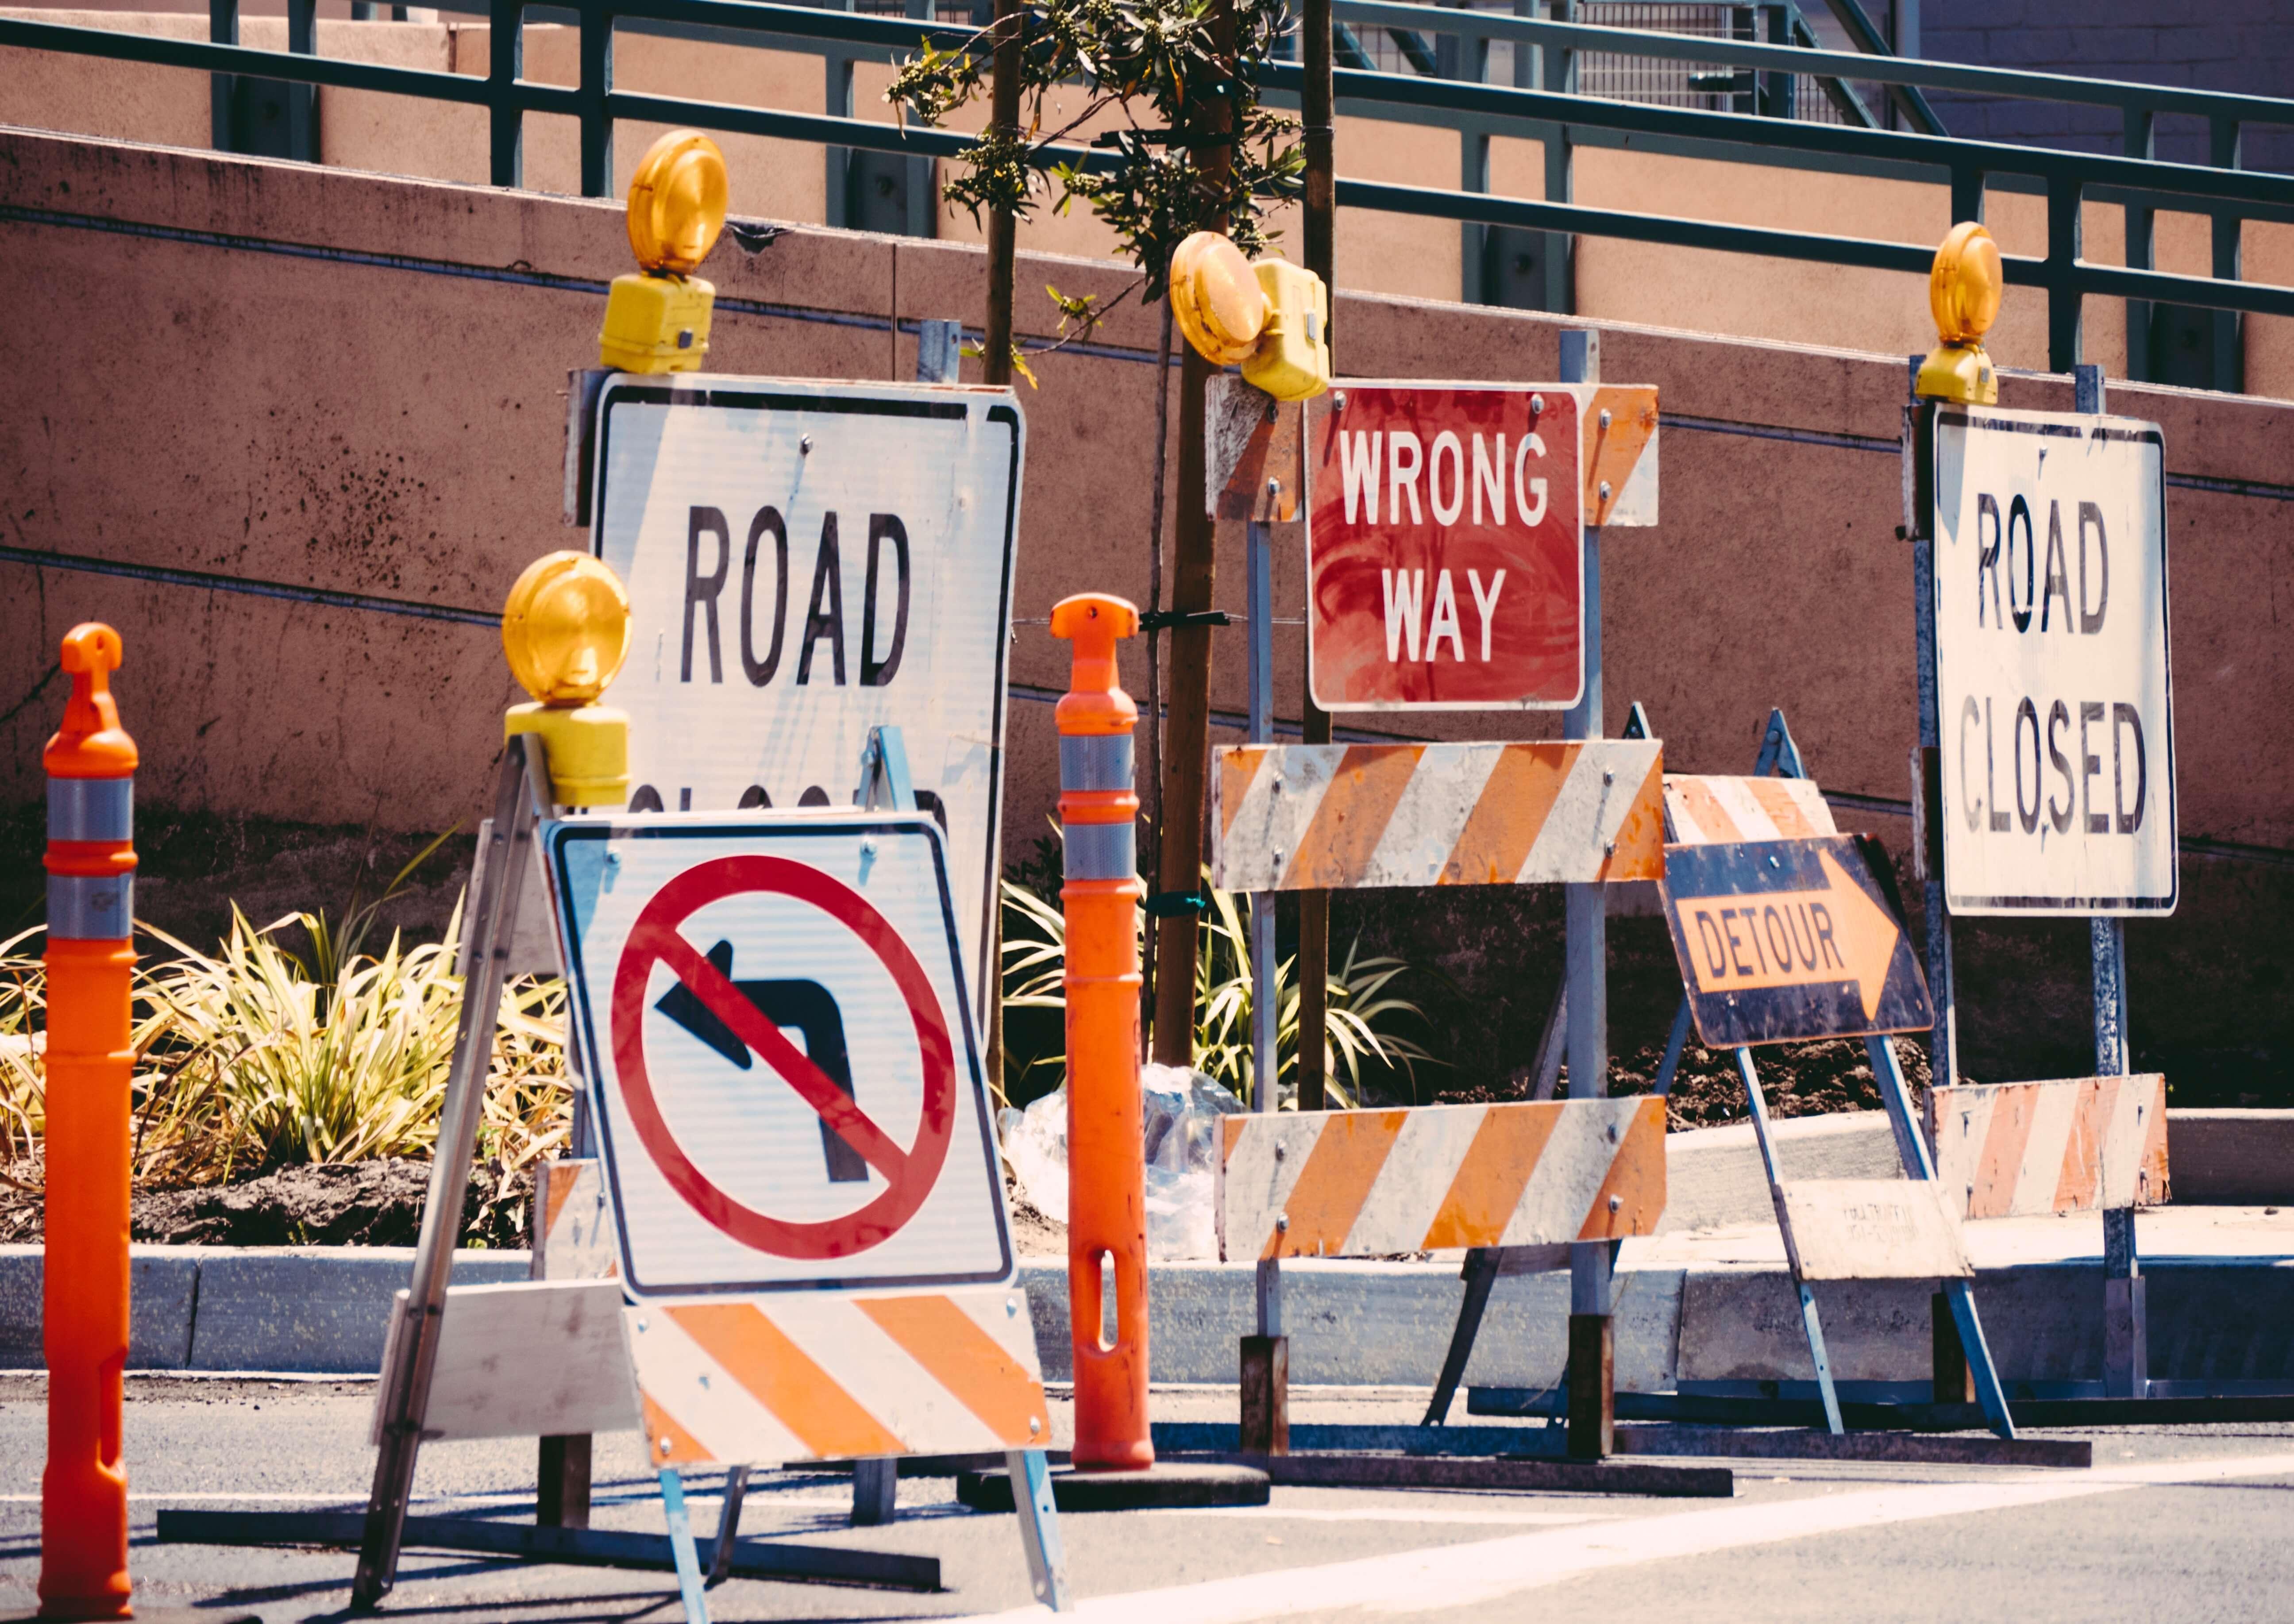 Concrete companies prefer using ultra-thin hot mix asphalt.